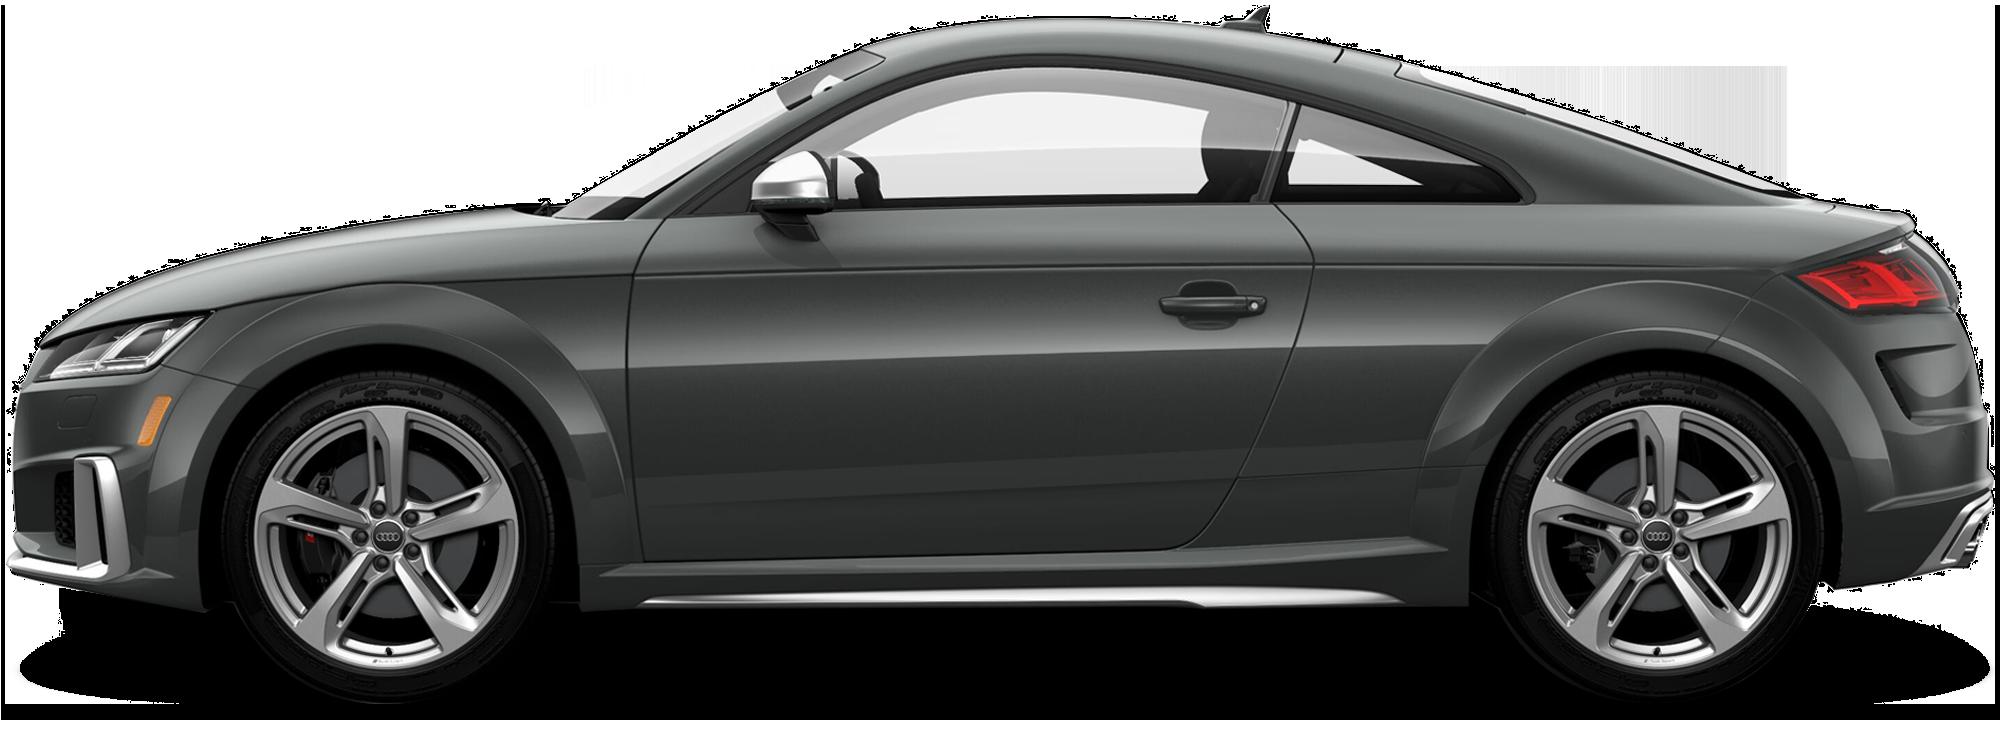 2019 Audi TTS Coupe 2.0T